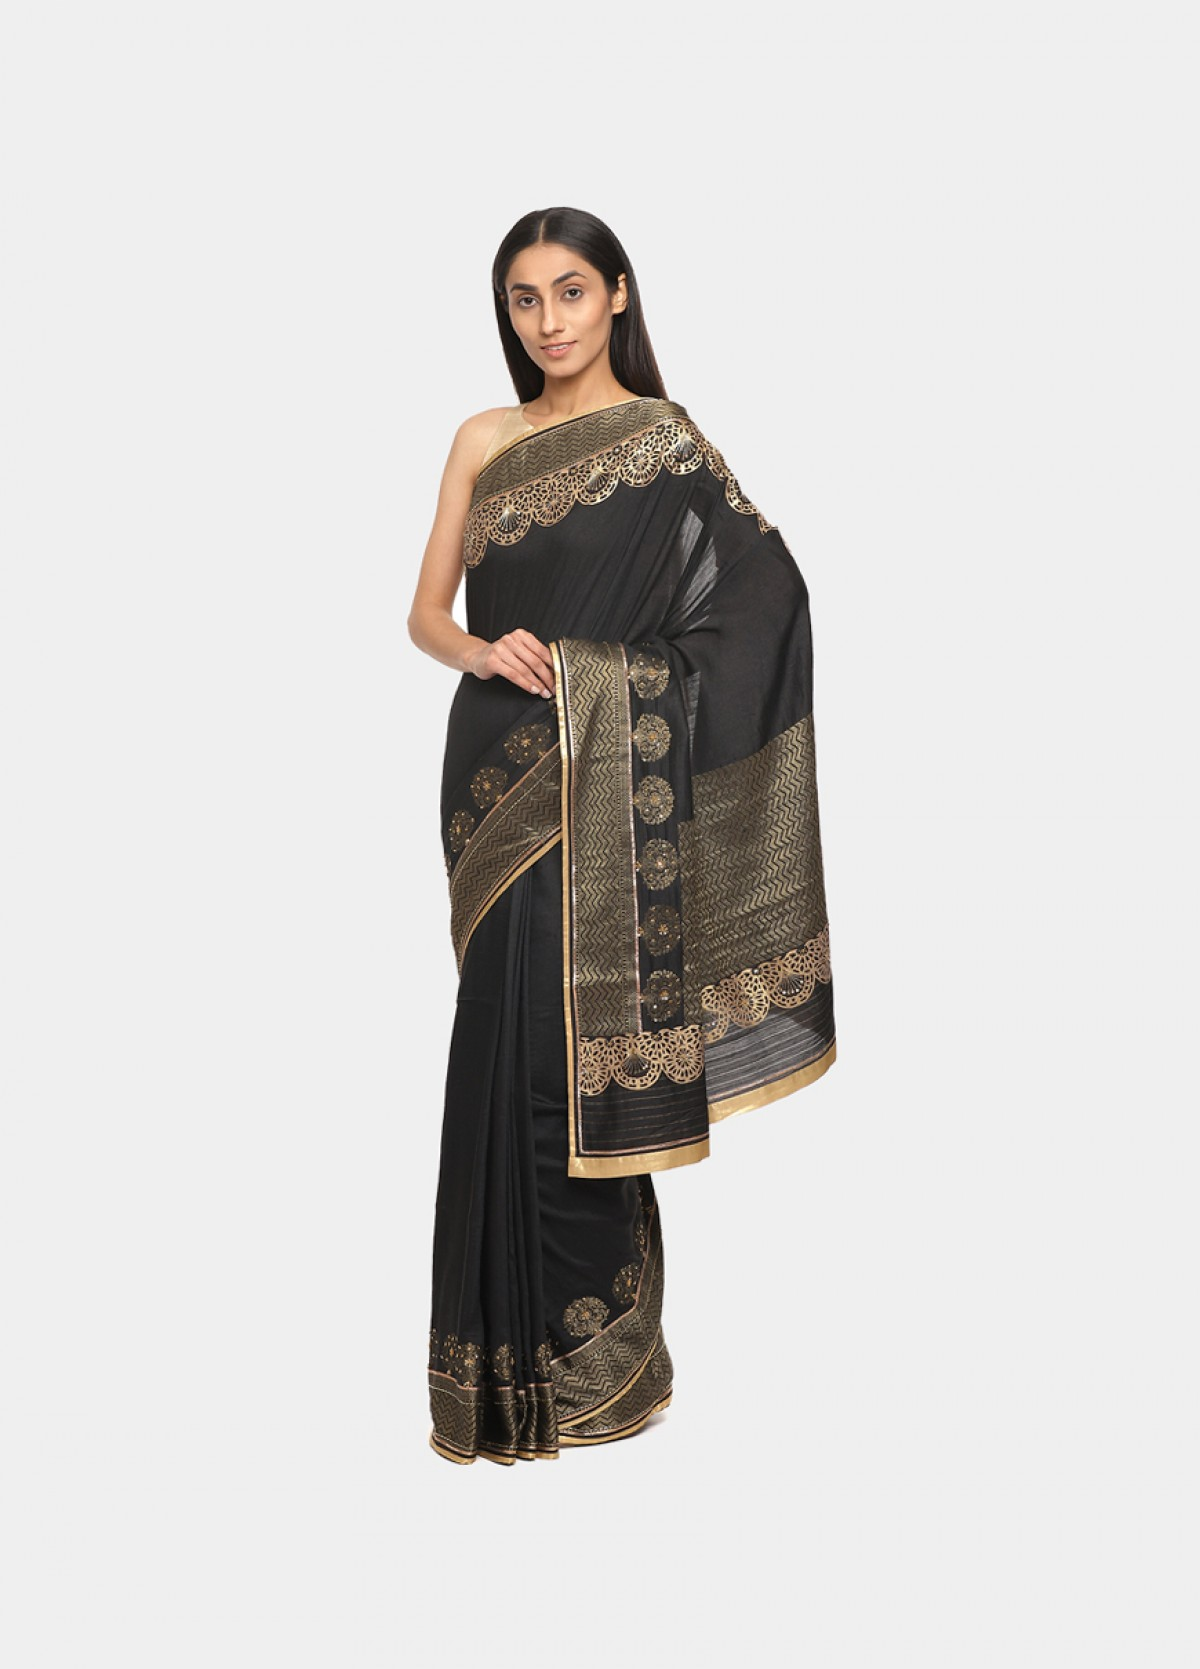 The Silk Black Embroidered Sari